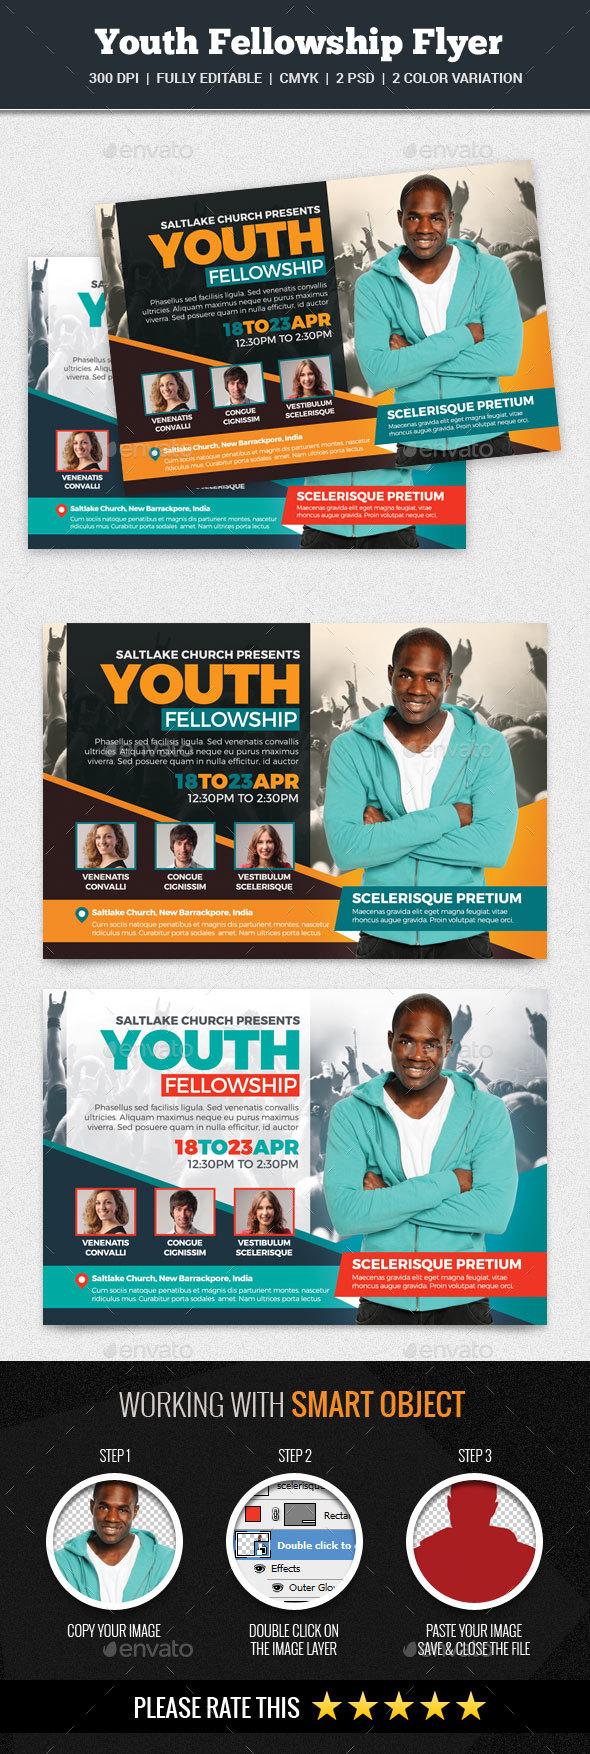 Youth Fellowship Flyer - Church Flyers